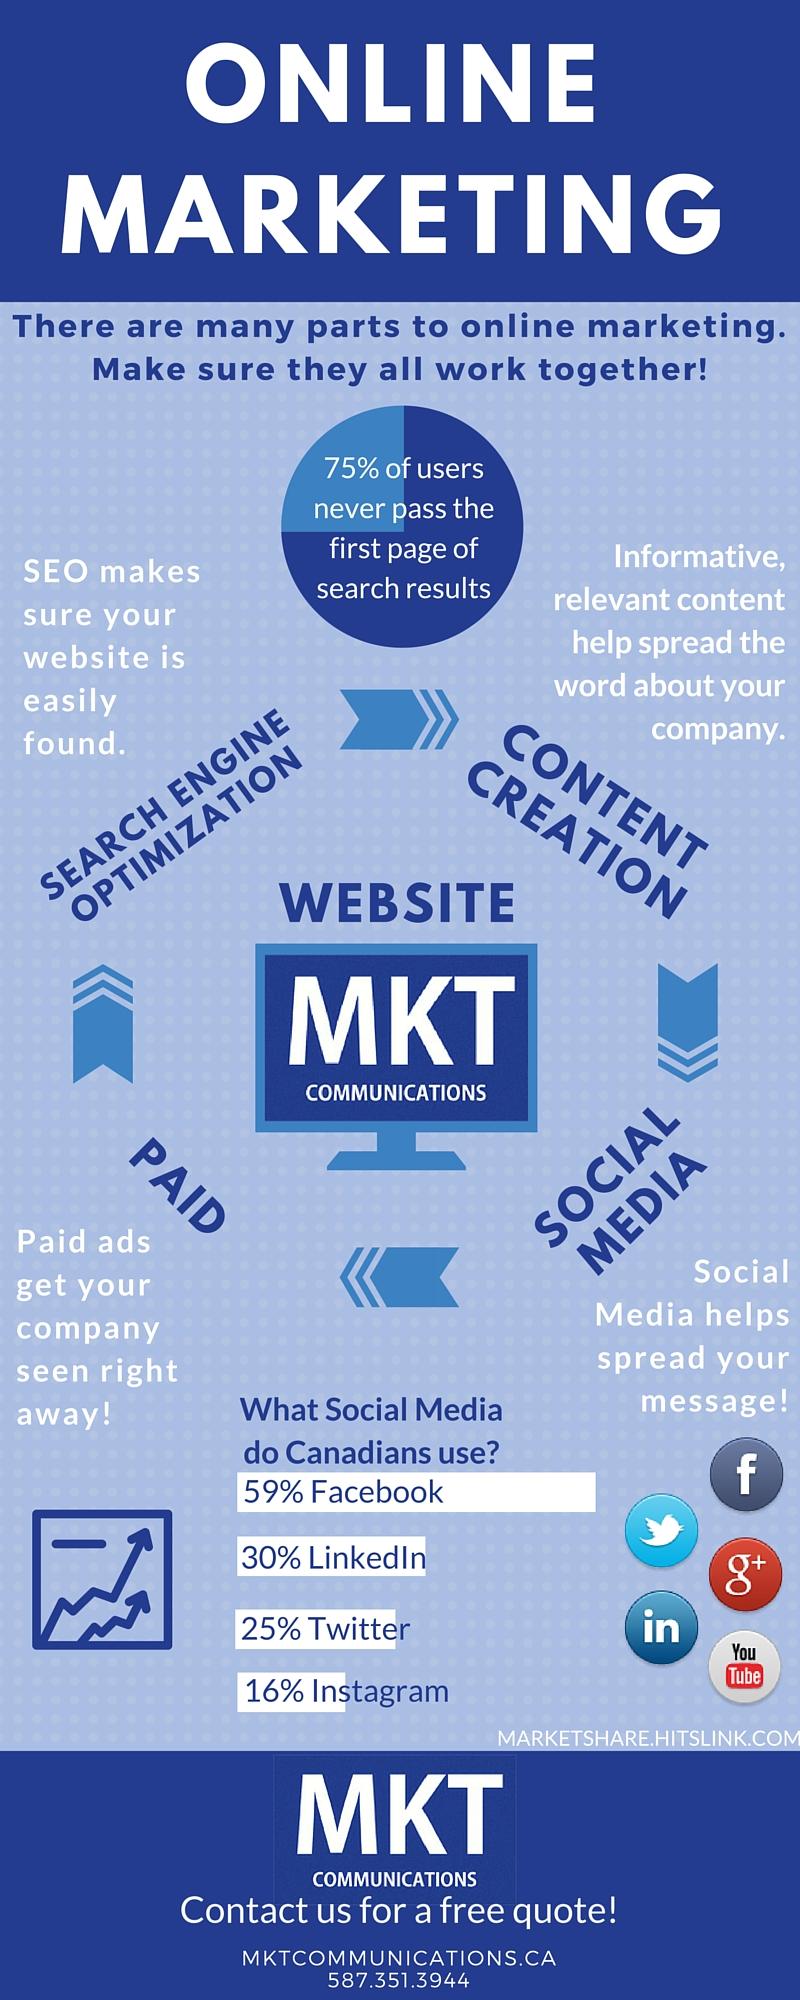 MKT Overview